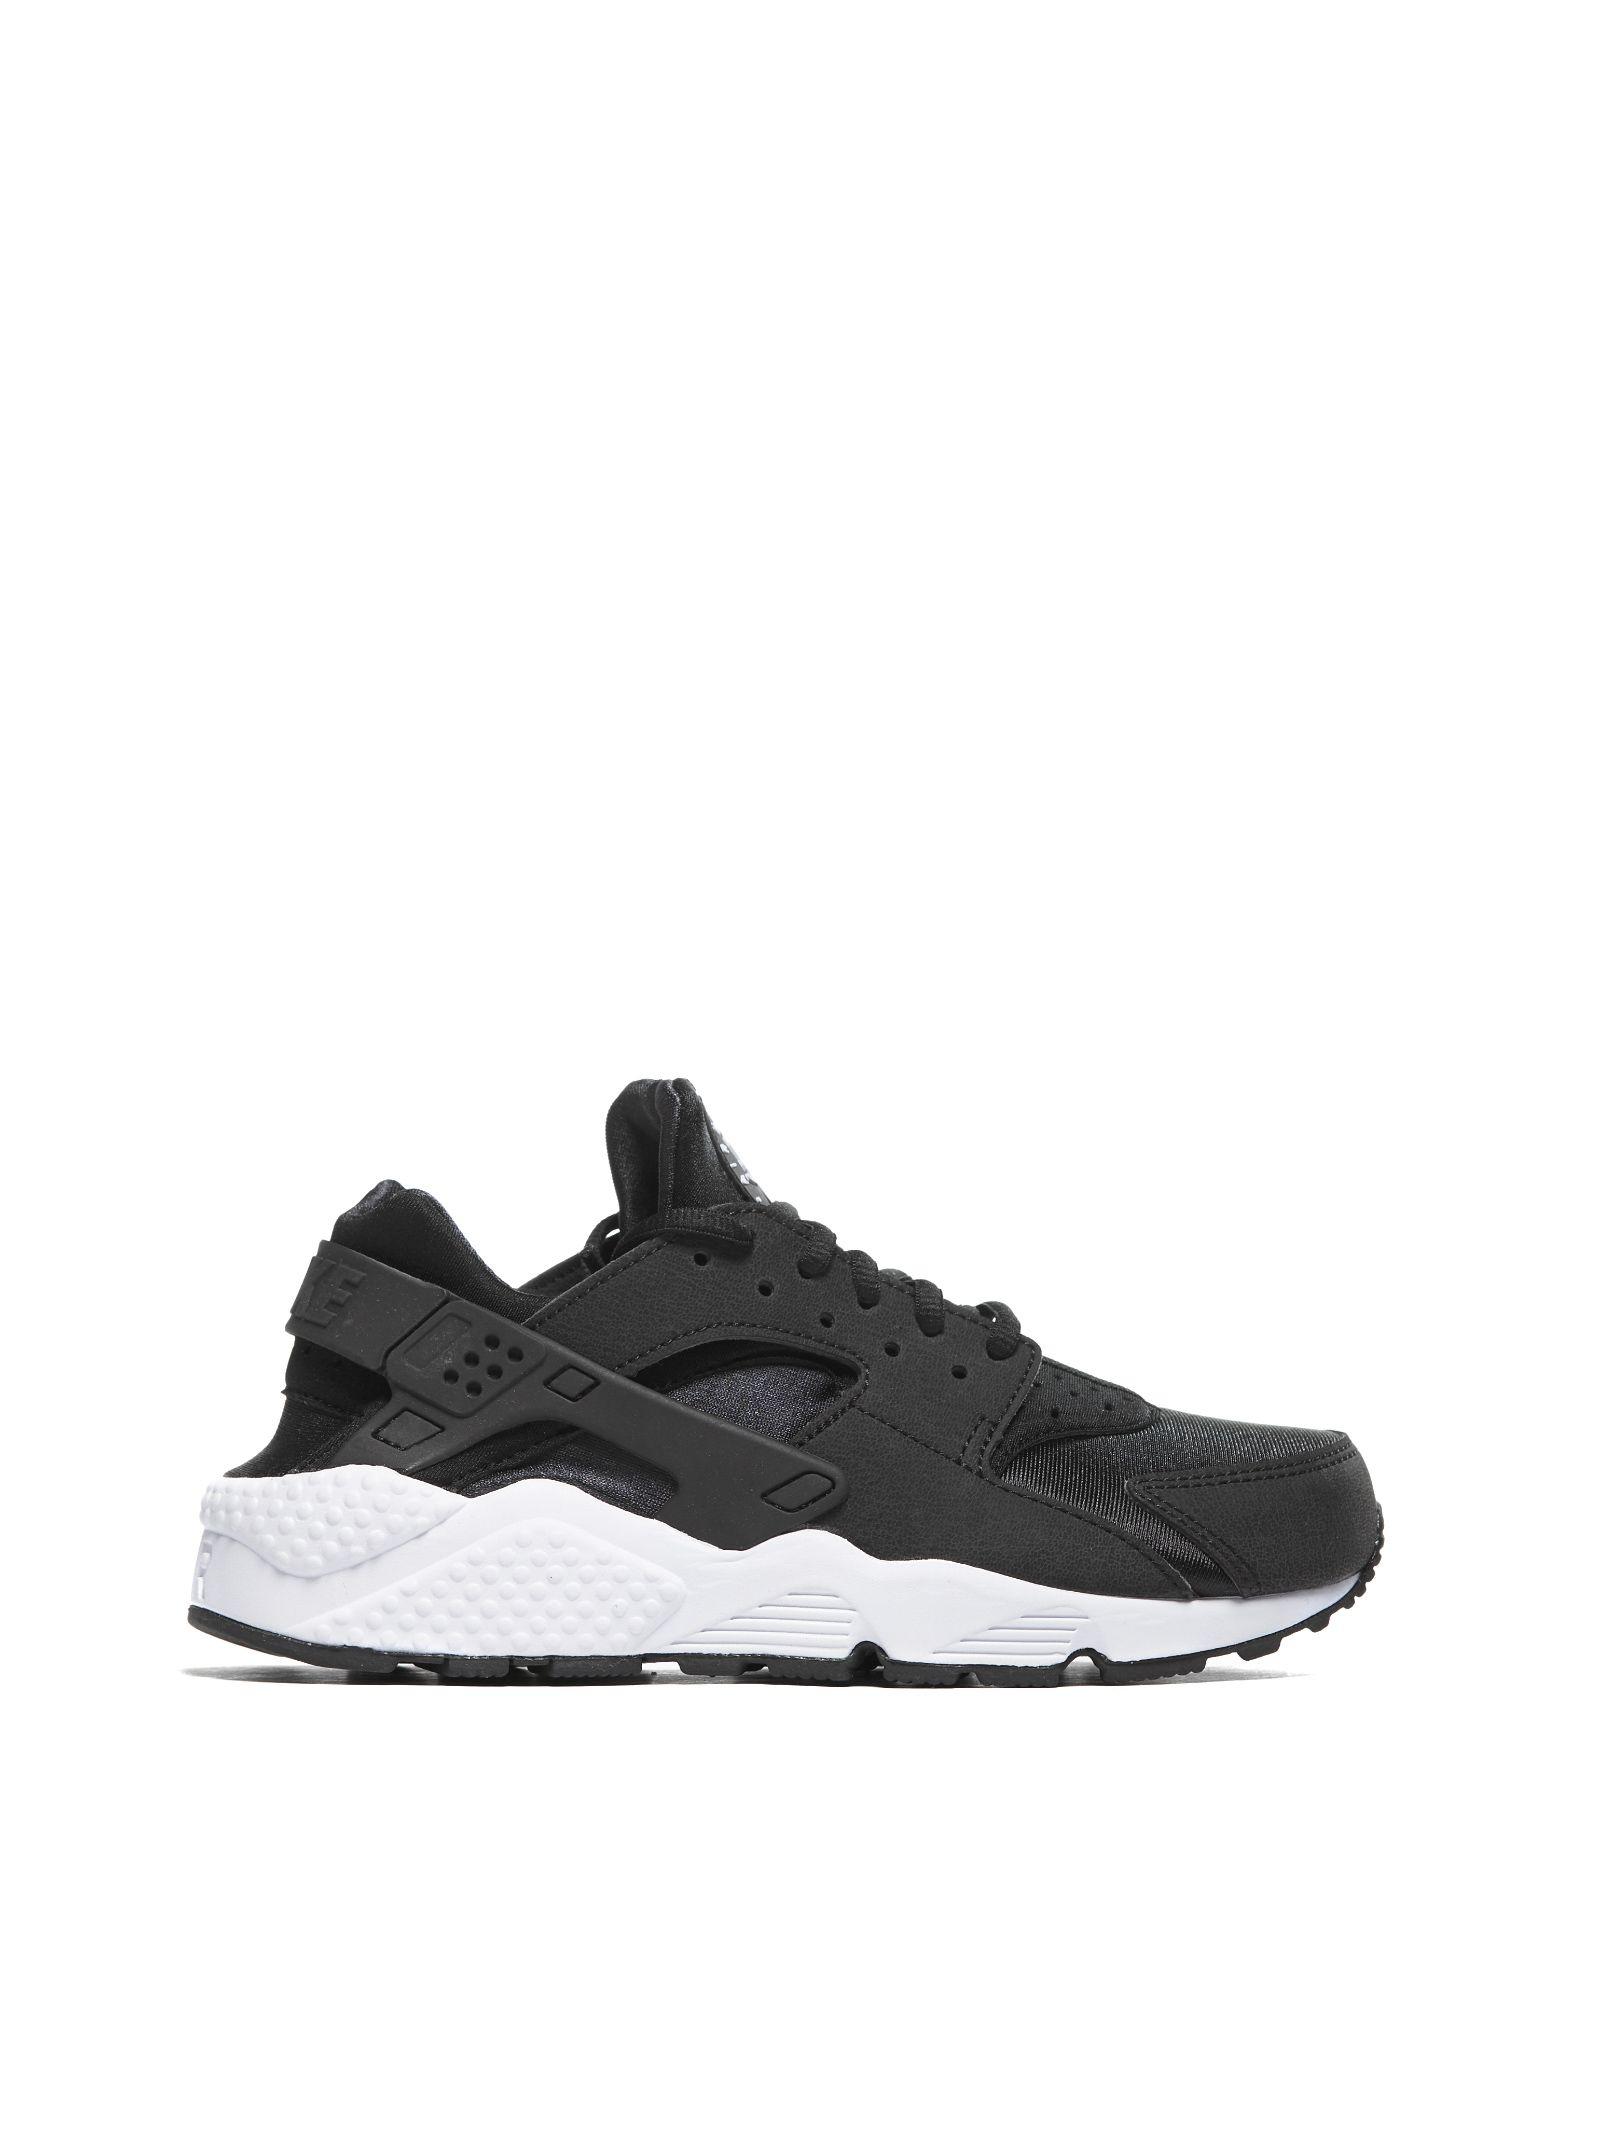 new concept 48d8e f330a Nike Air Huarache Run Sneakers - Nero bianco ...